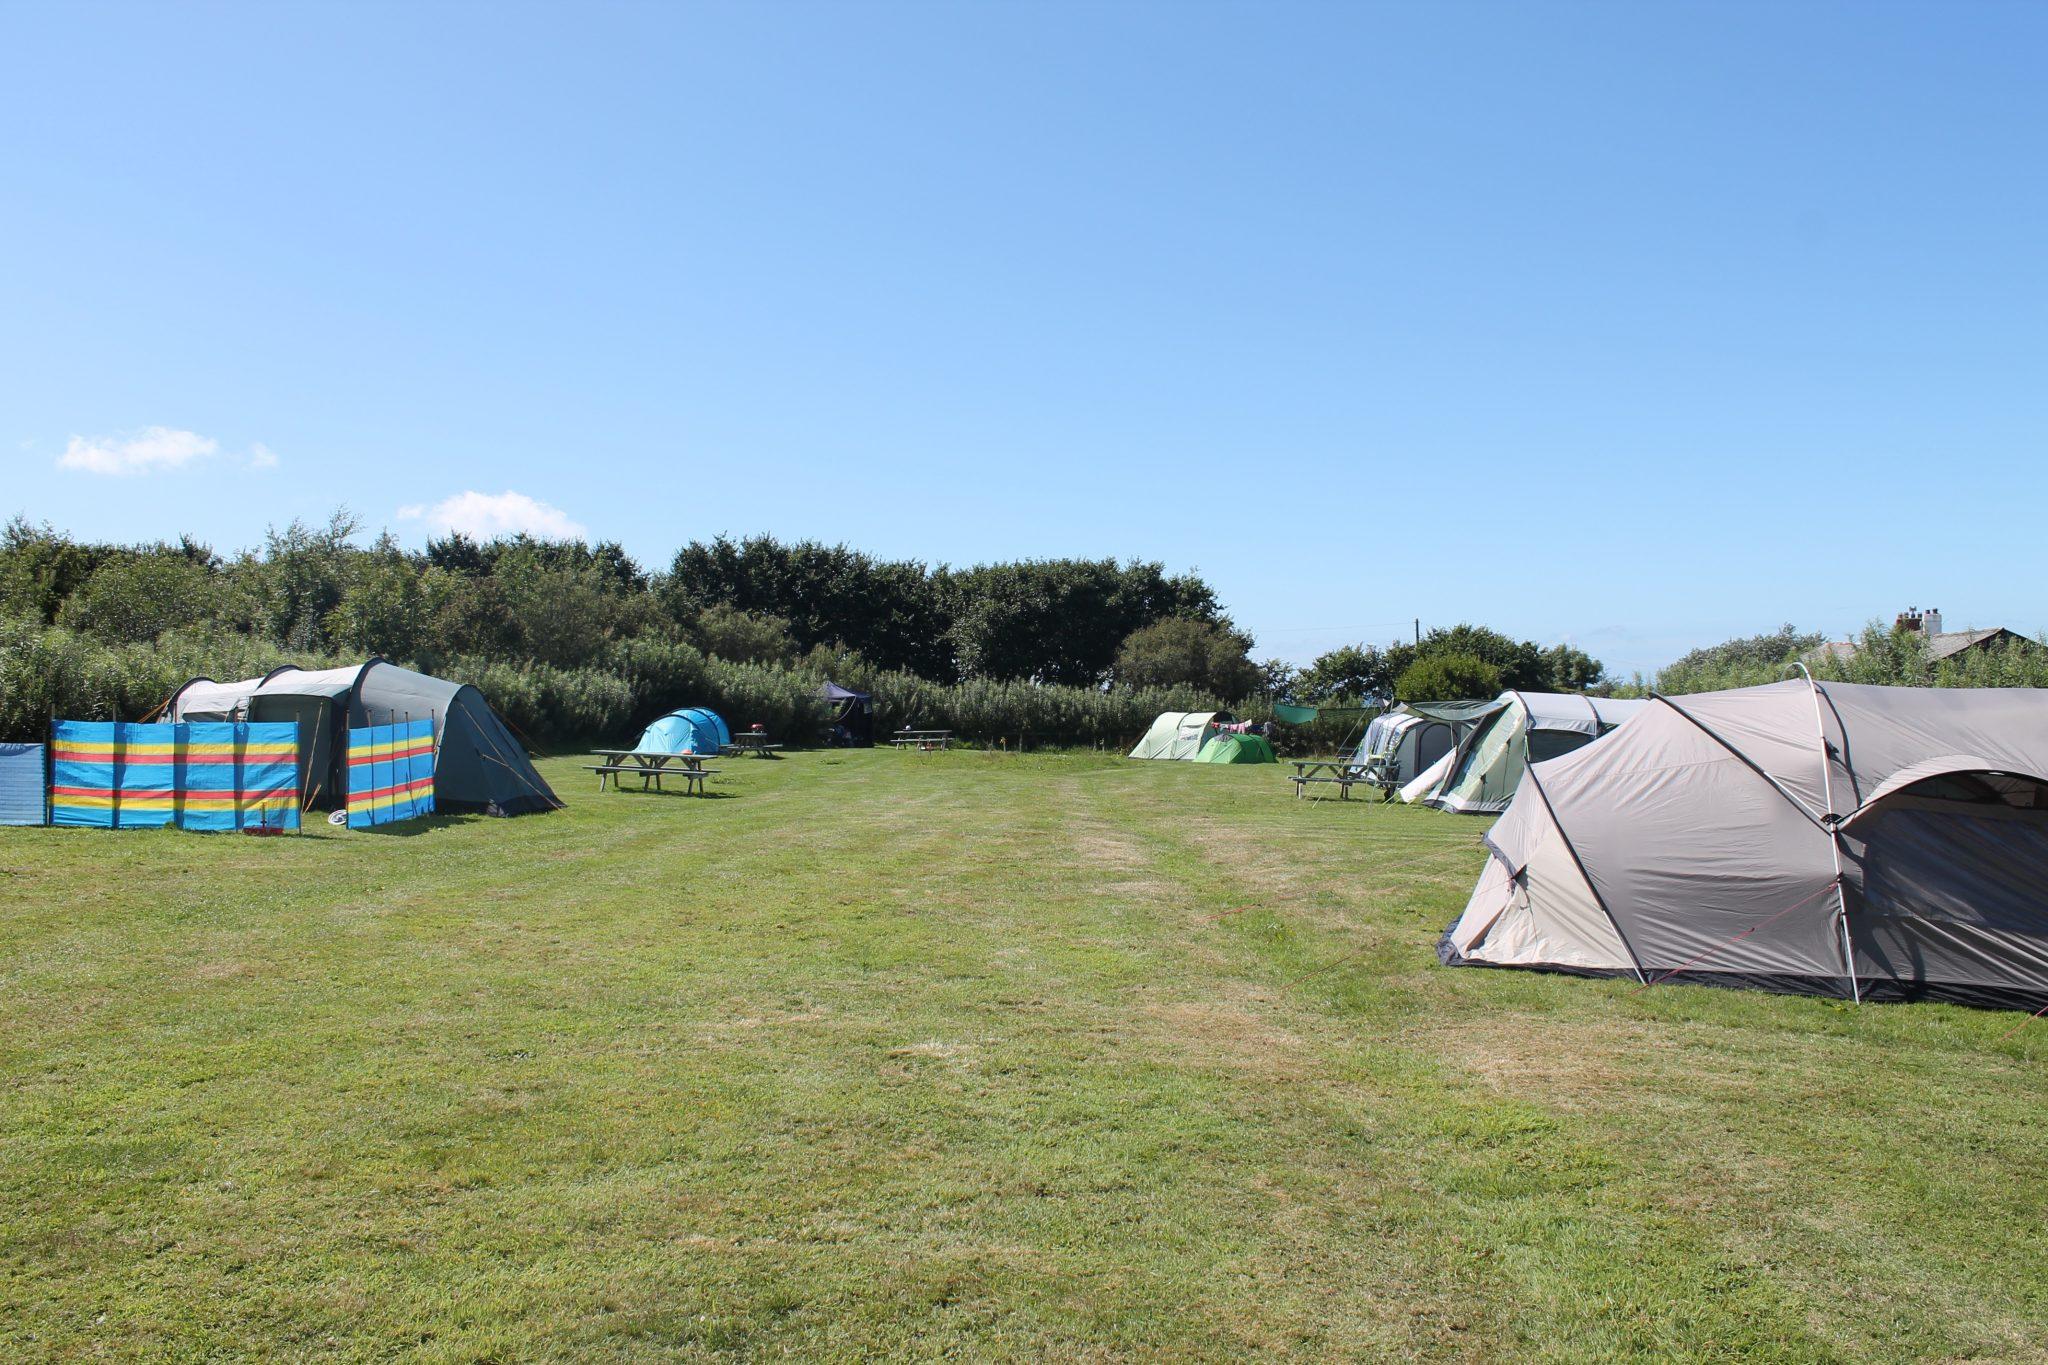 Pembrokeshire Campsite, Camping near Little Haven, Coastal camping, Campsite in Pembrokeshire